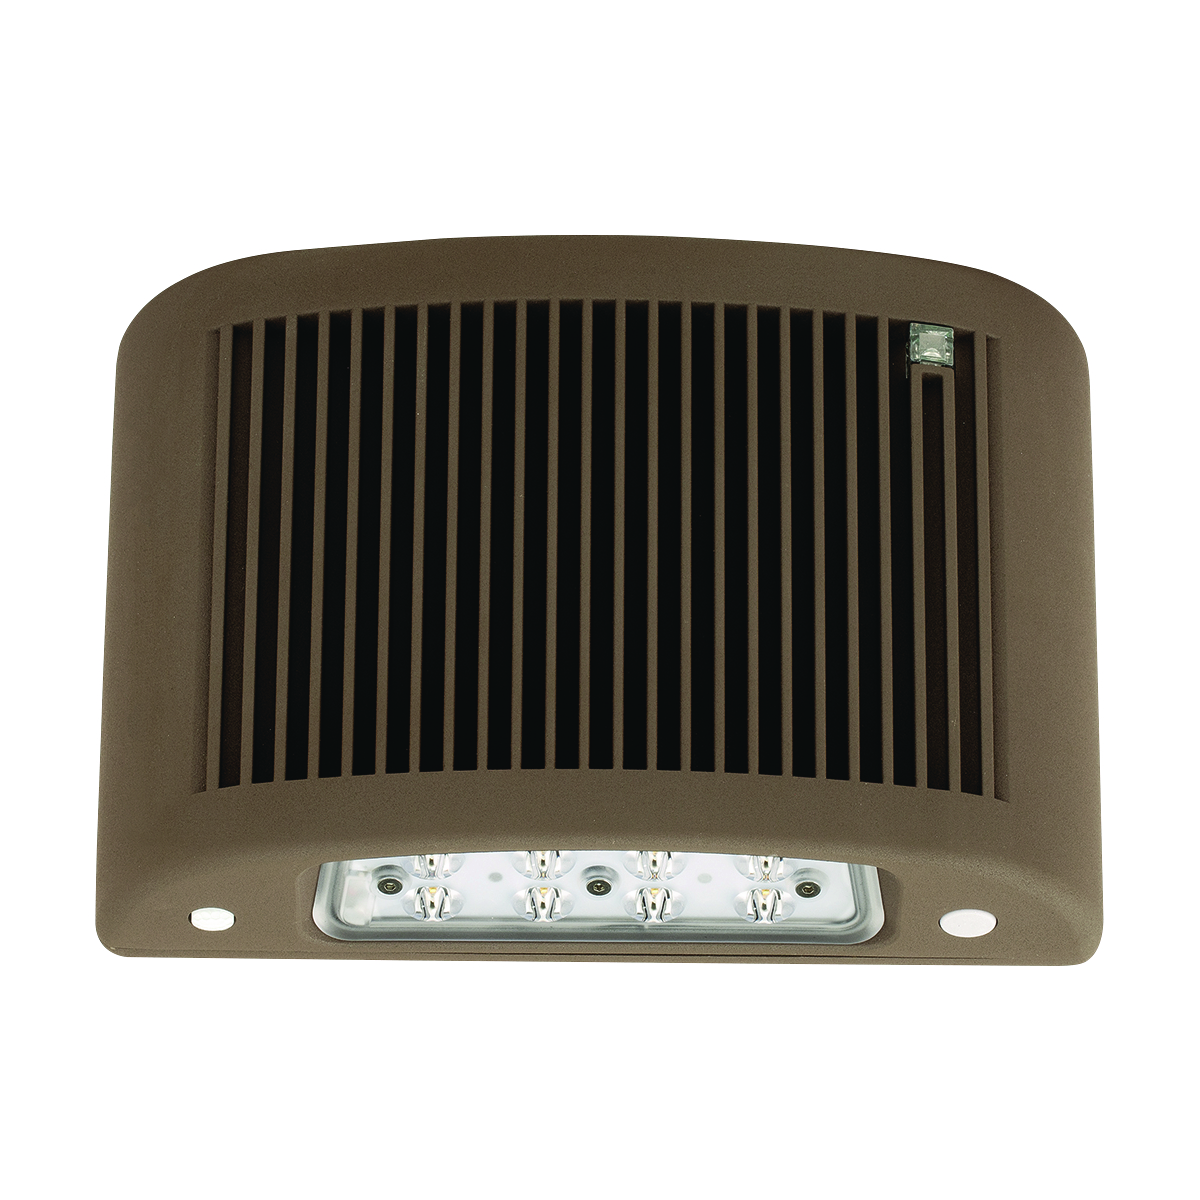 CUSO-DB-H HUBBELL SLIM LED AC/EMERGENCY OUTDOOR LIGHT 1,600 LUMENS AC AND 600 LUMENS EMERGENCY